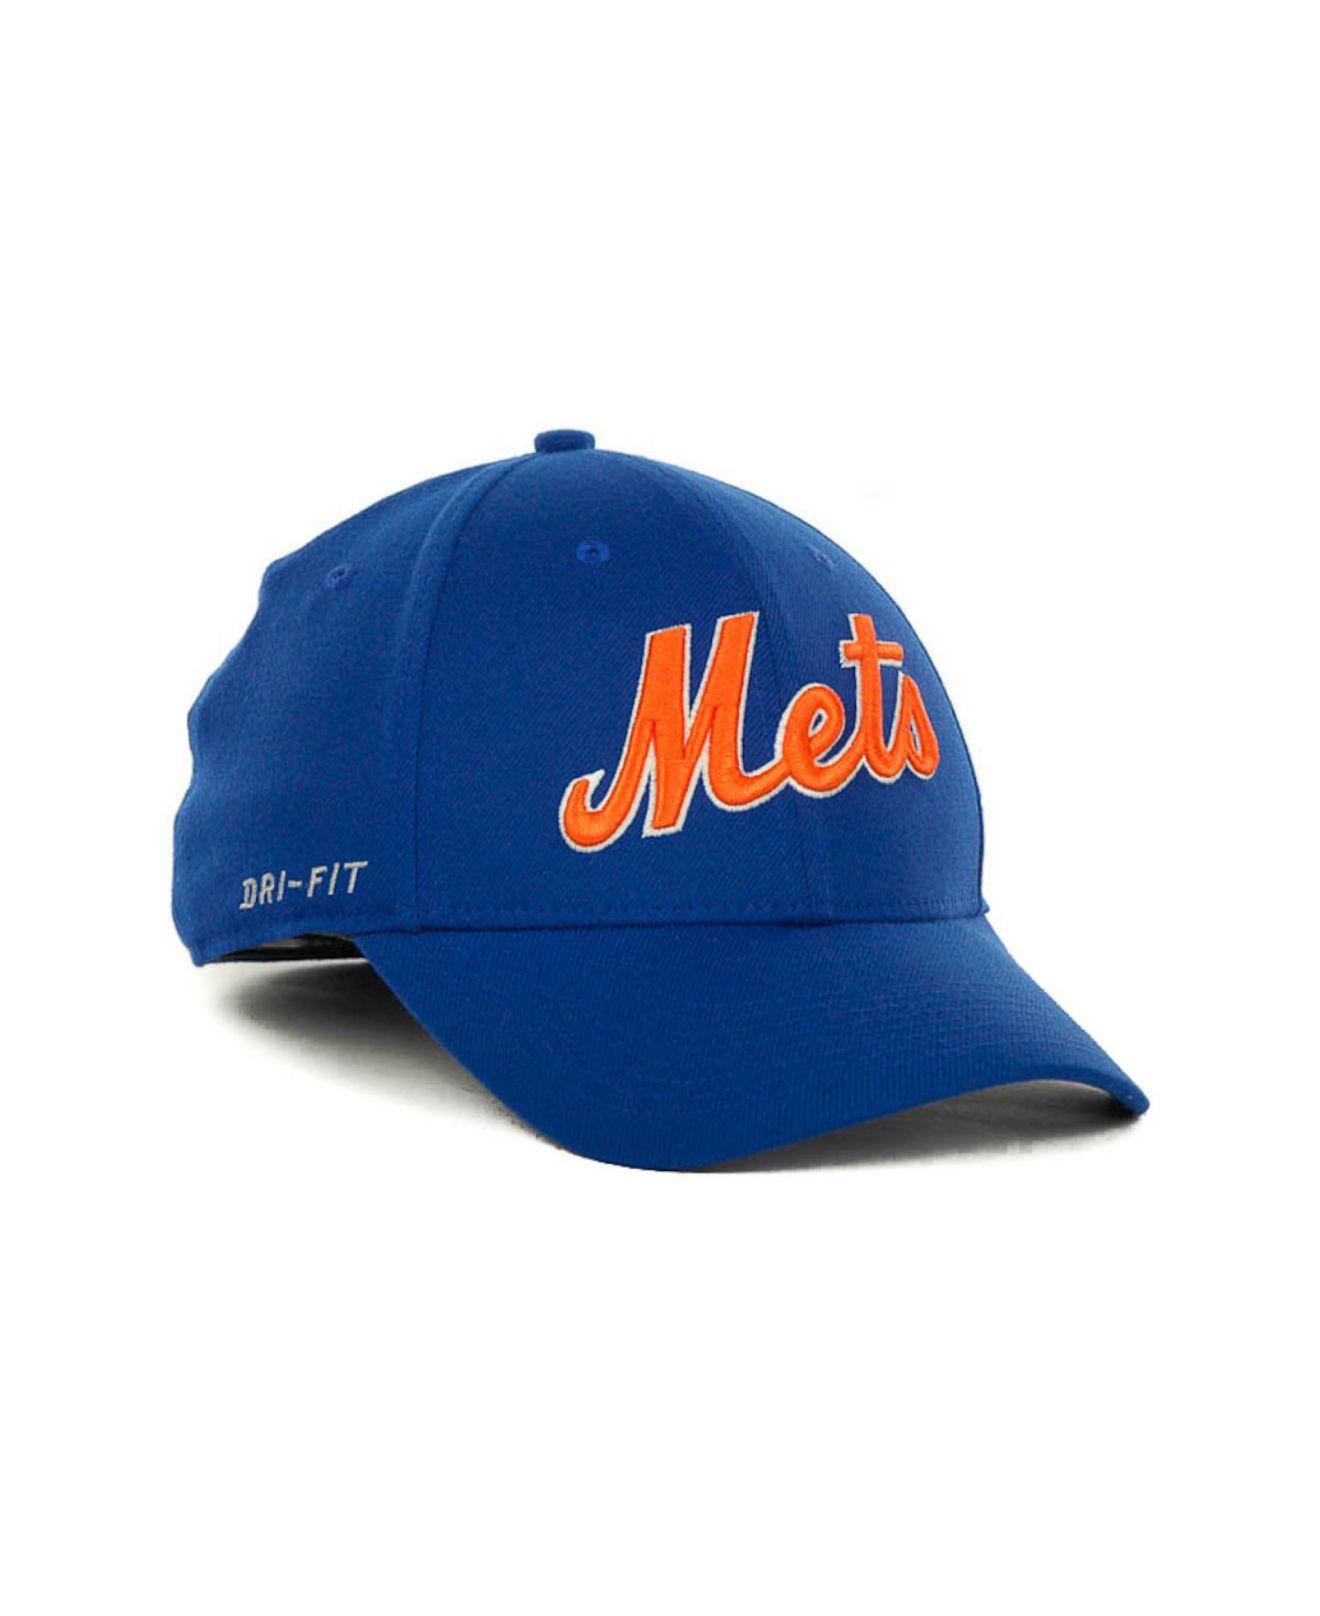 2a631ed04fff9 Nike New York Mets Dri-fit Swoosh Flex Cap in Blue for Men - Lyst